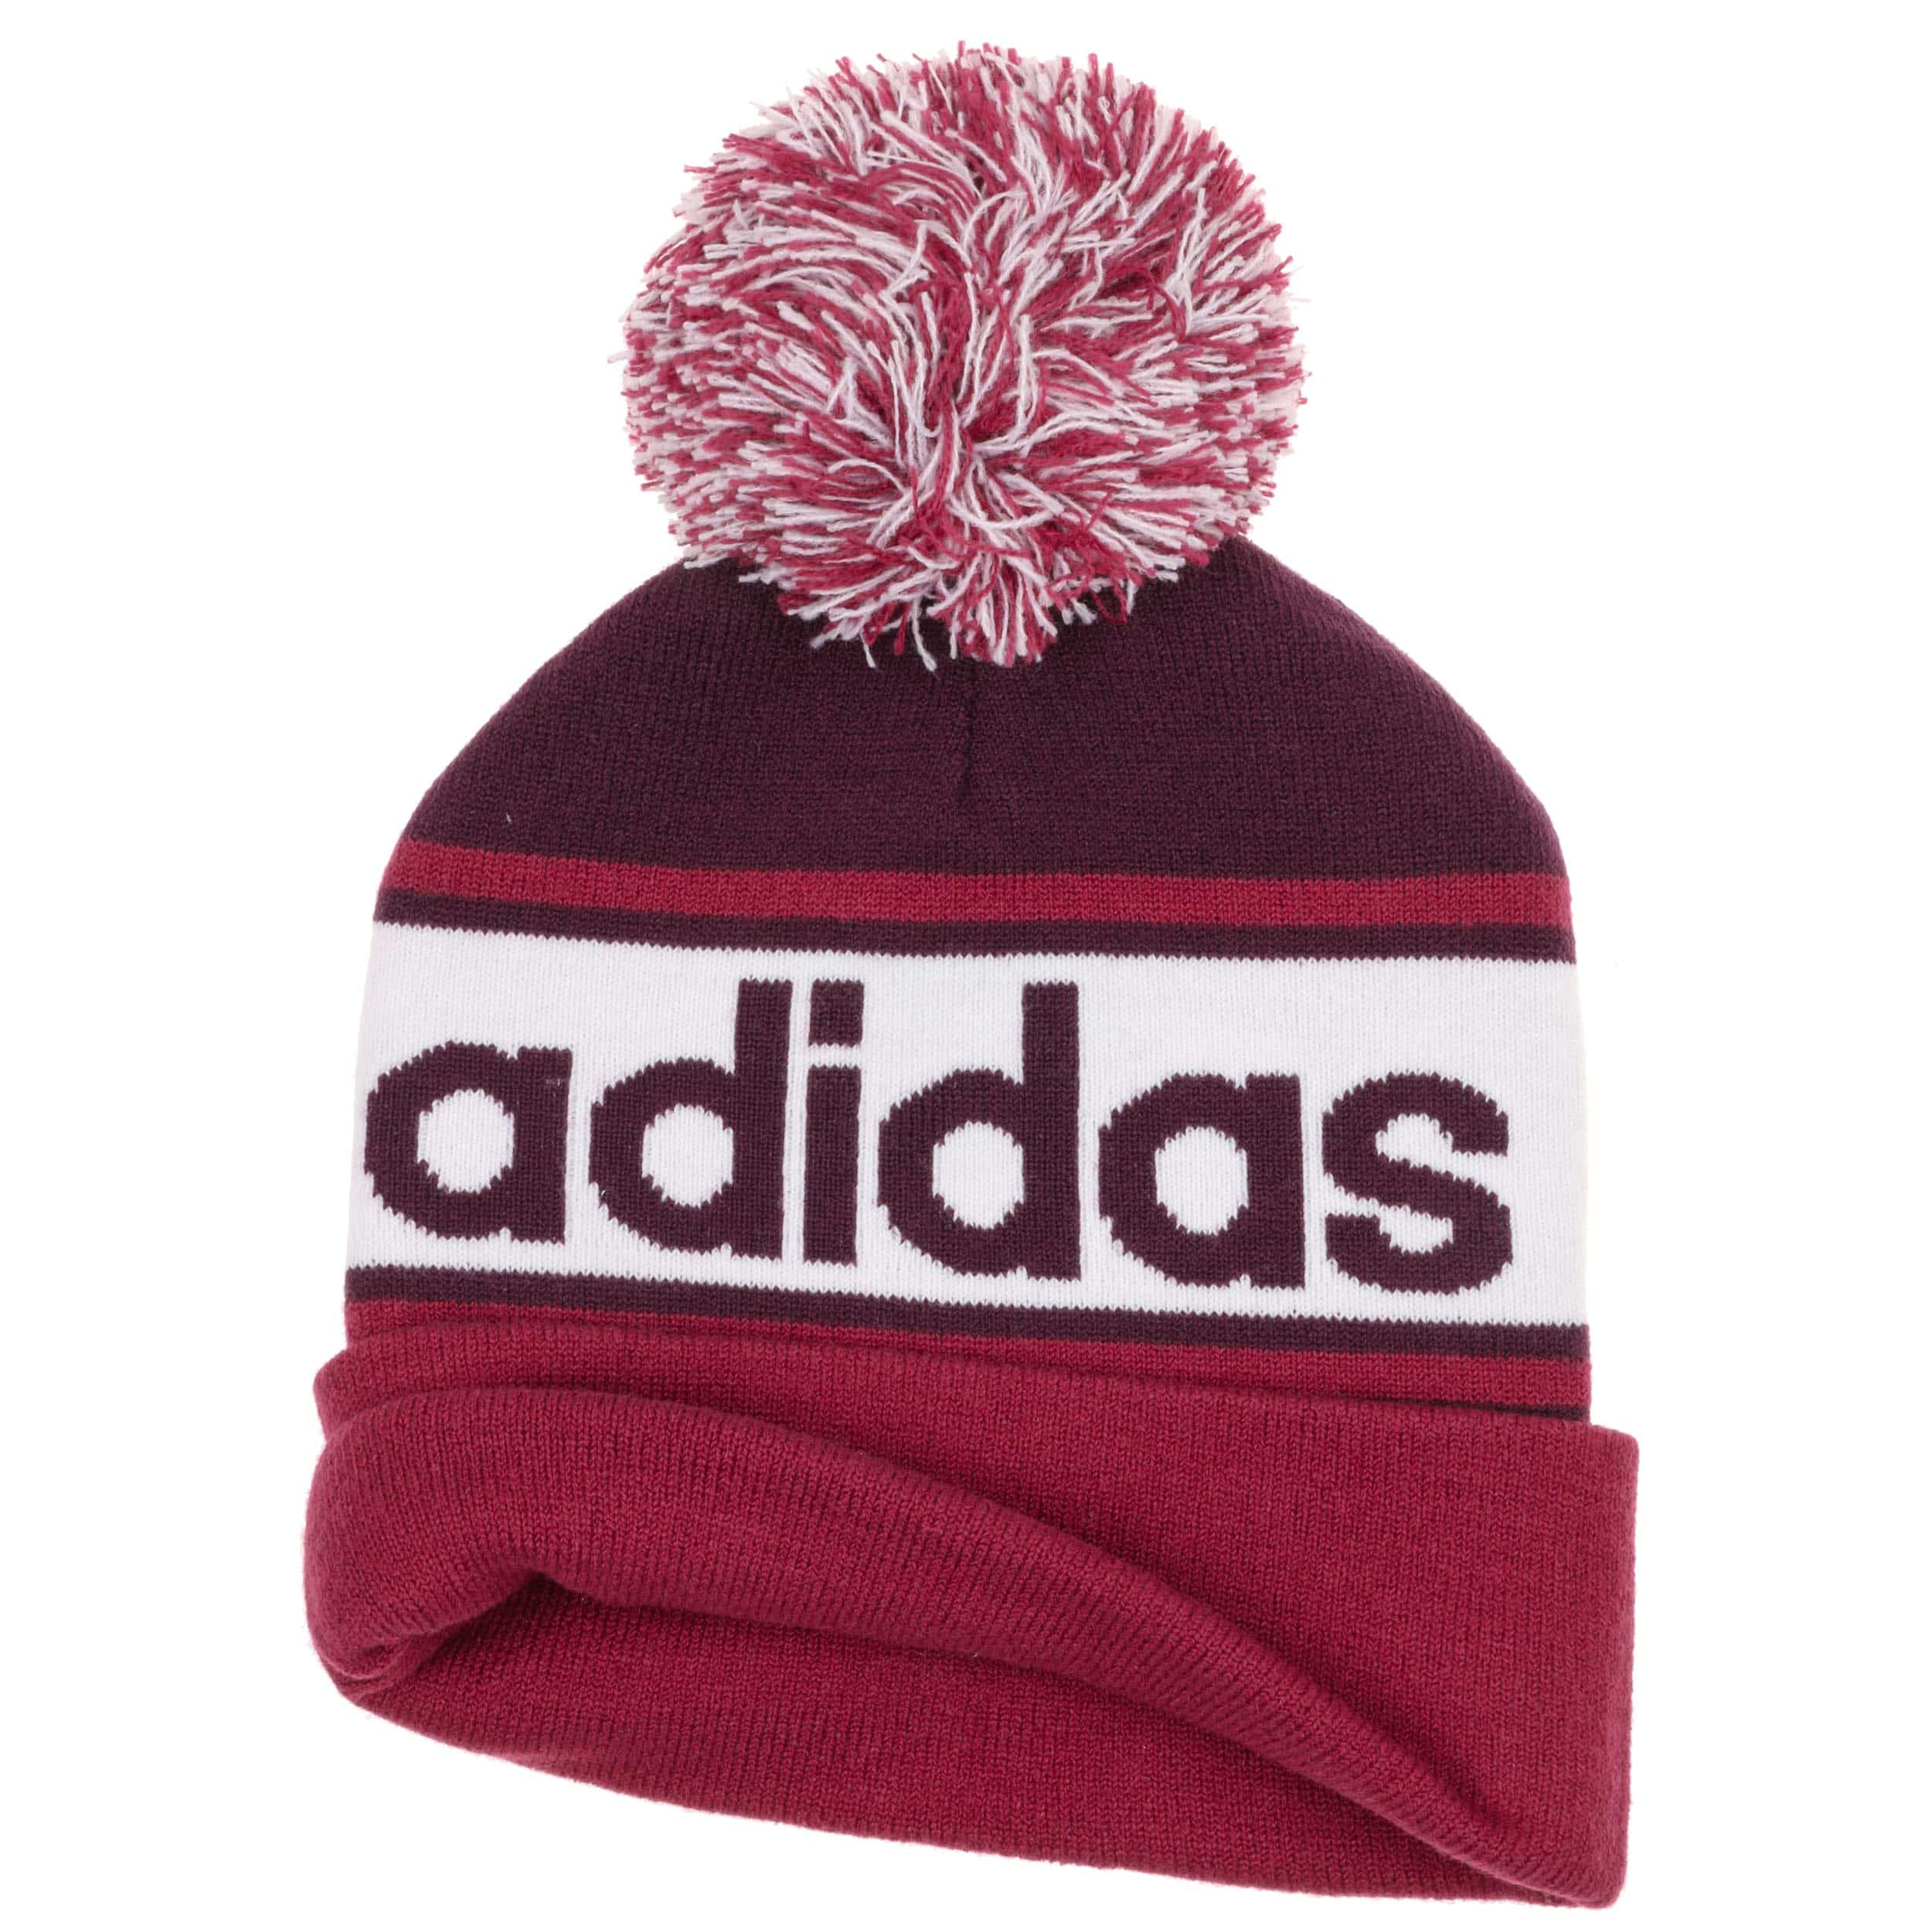 ... Woolie Beanie Pompom Hat by adidas - bordeaux 1 ... b5b249f179f